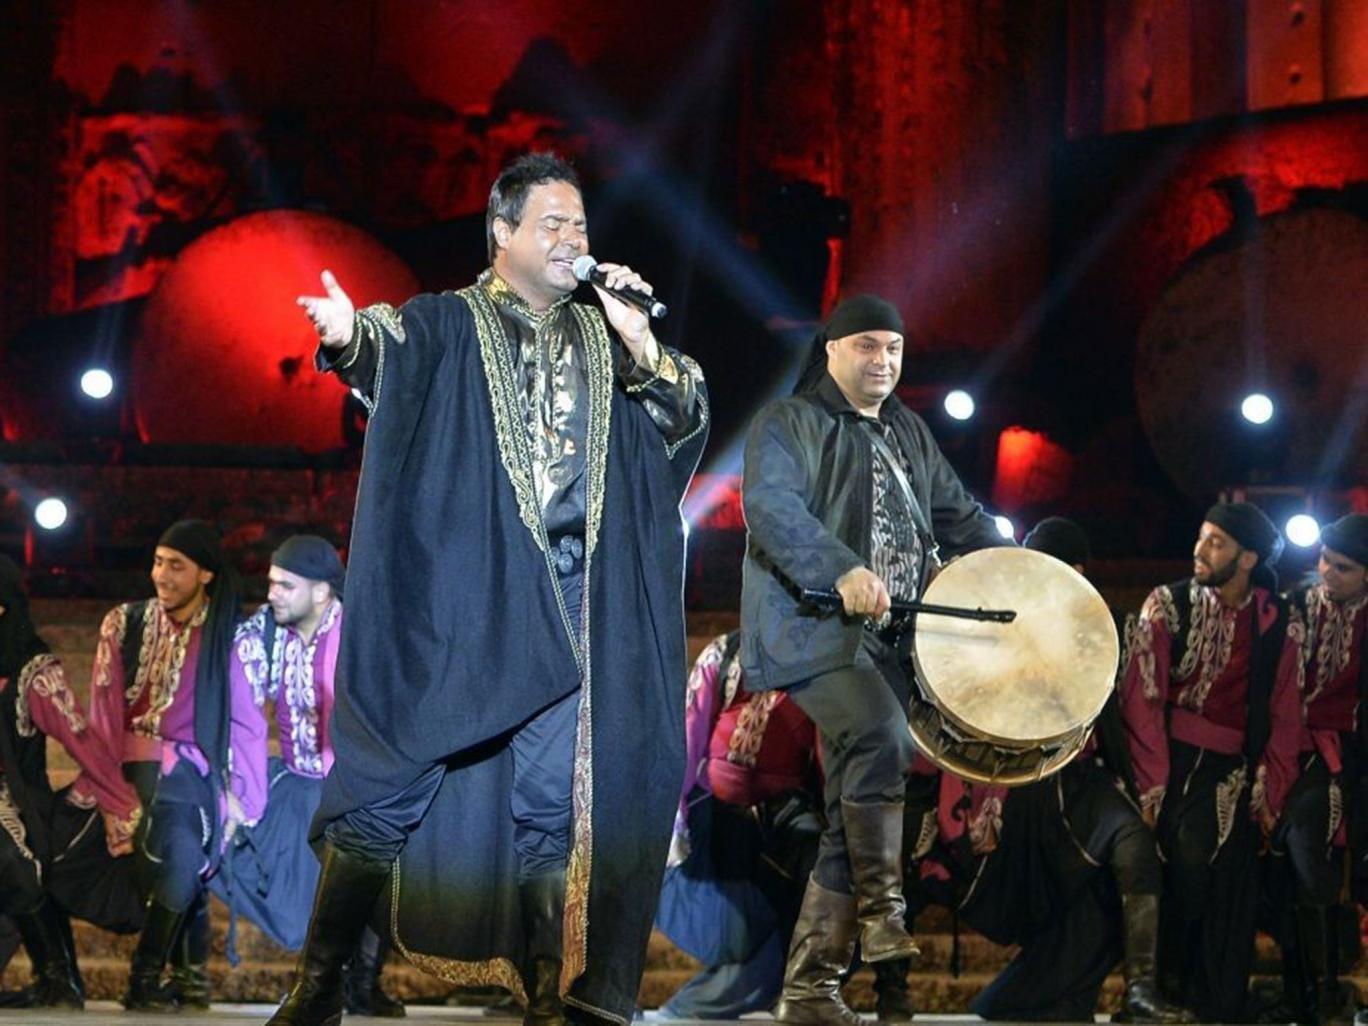 Show must go on: Lebanese singer Assi el Helani